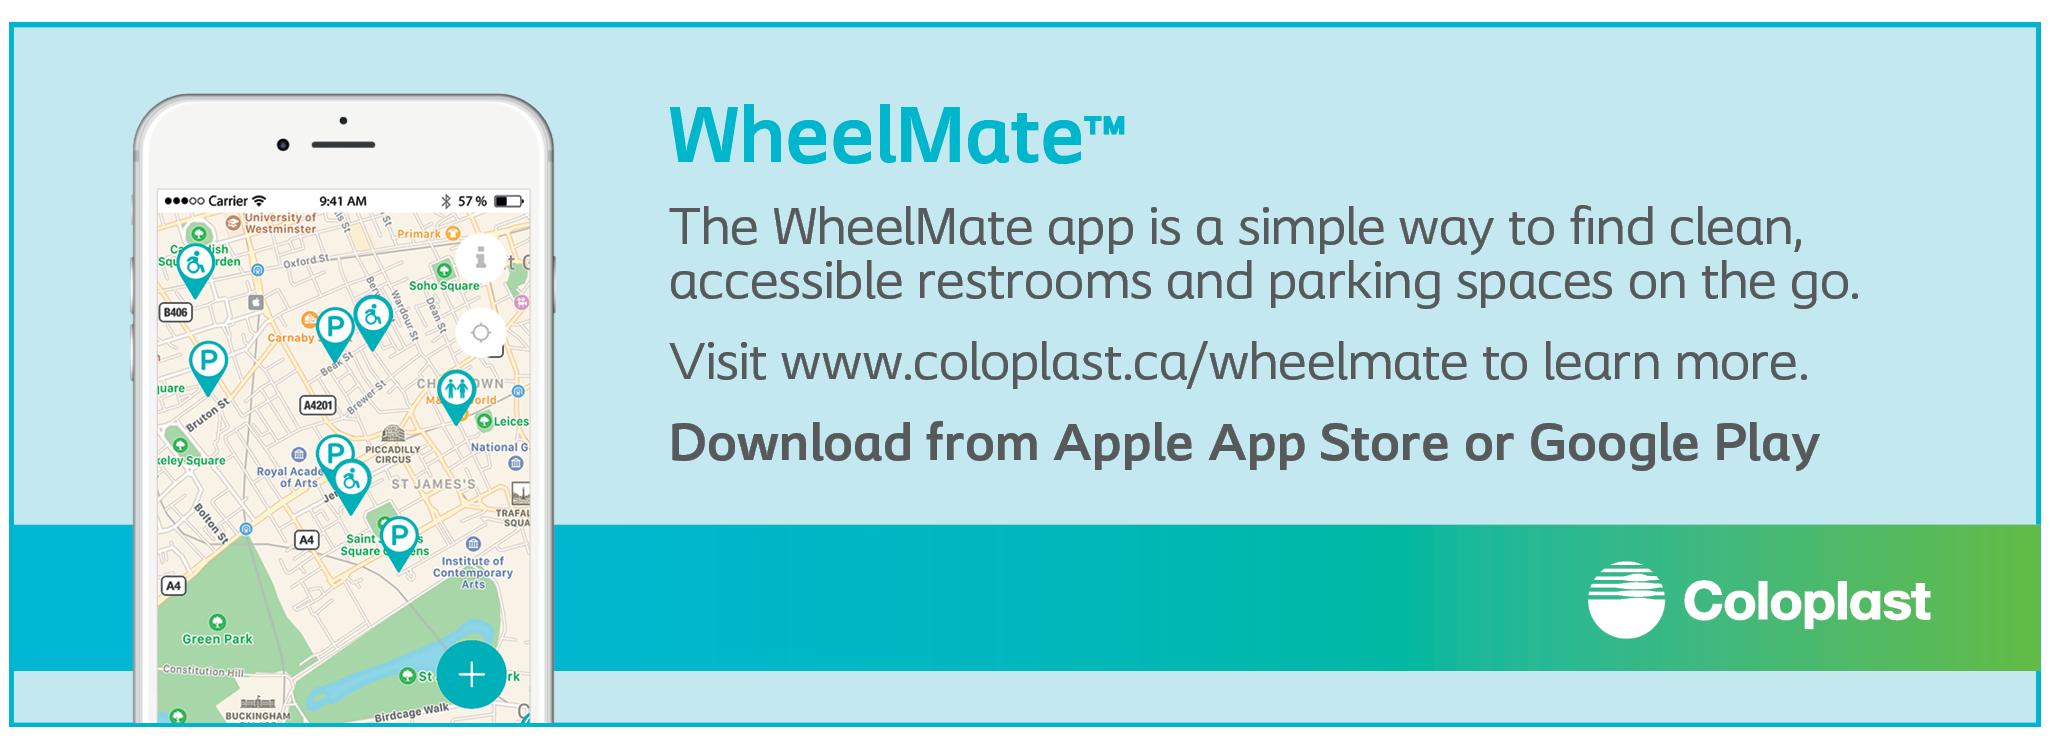 wheelmate-banner-ad